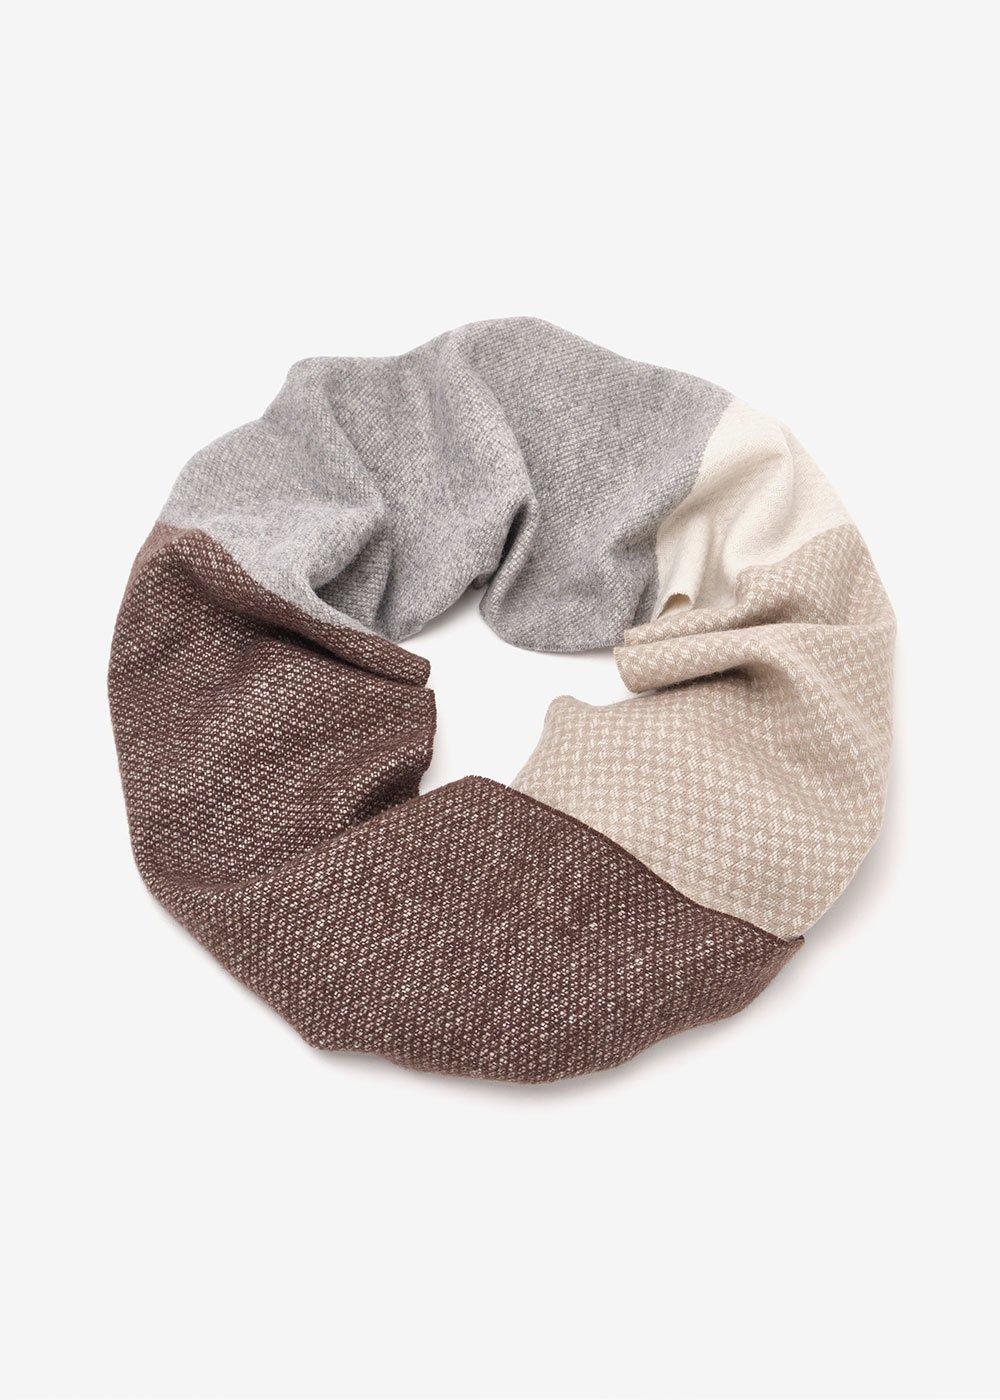 Sylvi patterned scarf - Marrone Desert Fantasia - Woman